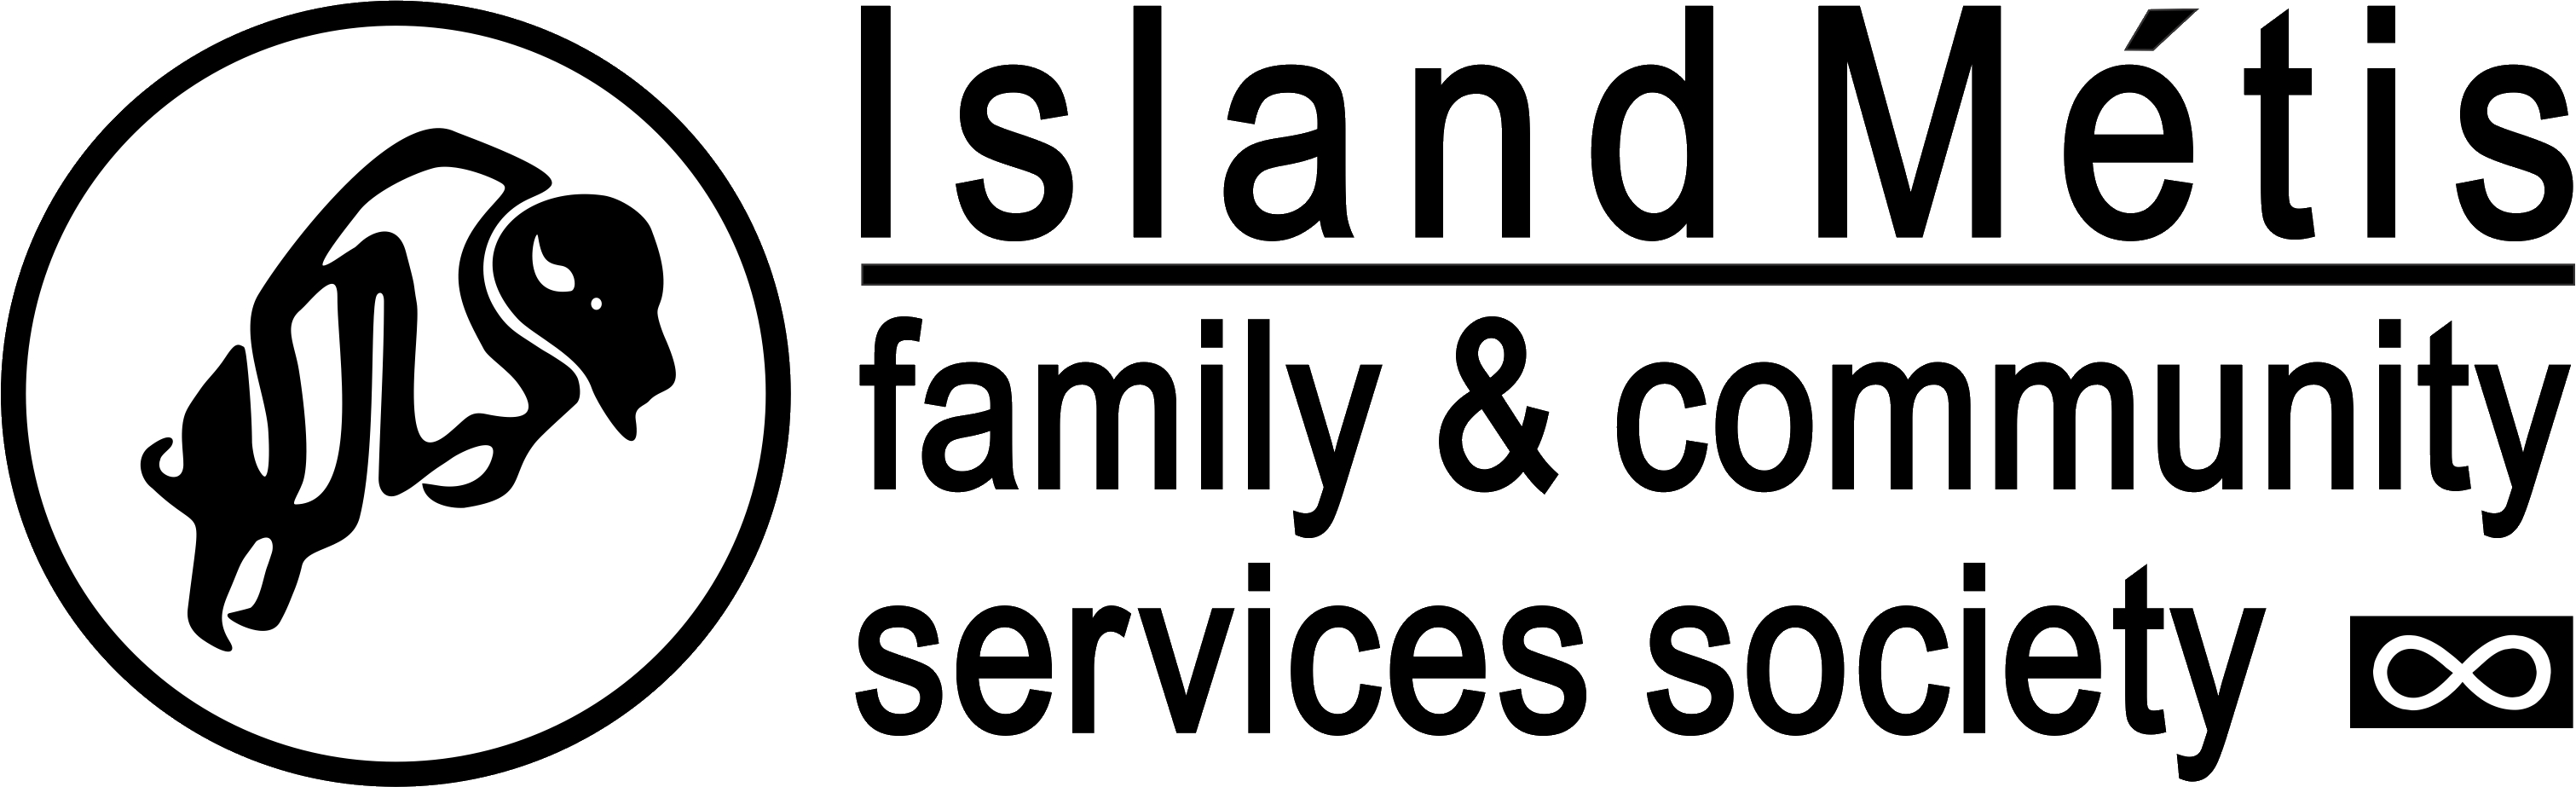 Island Métis Family and Community Services Society